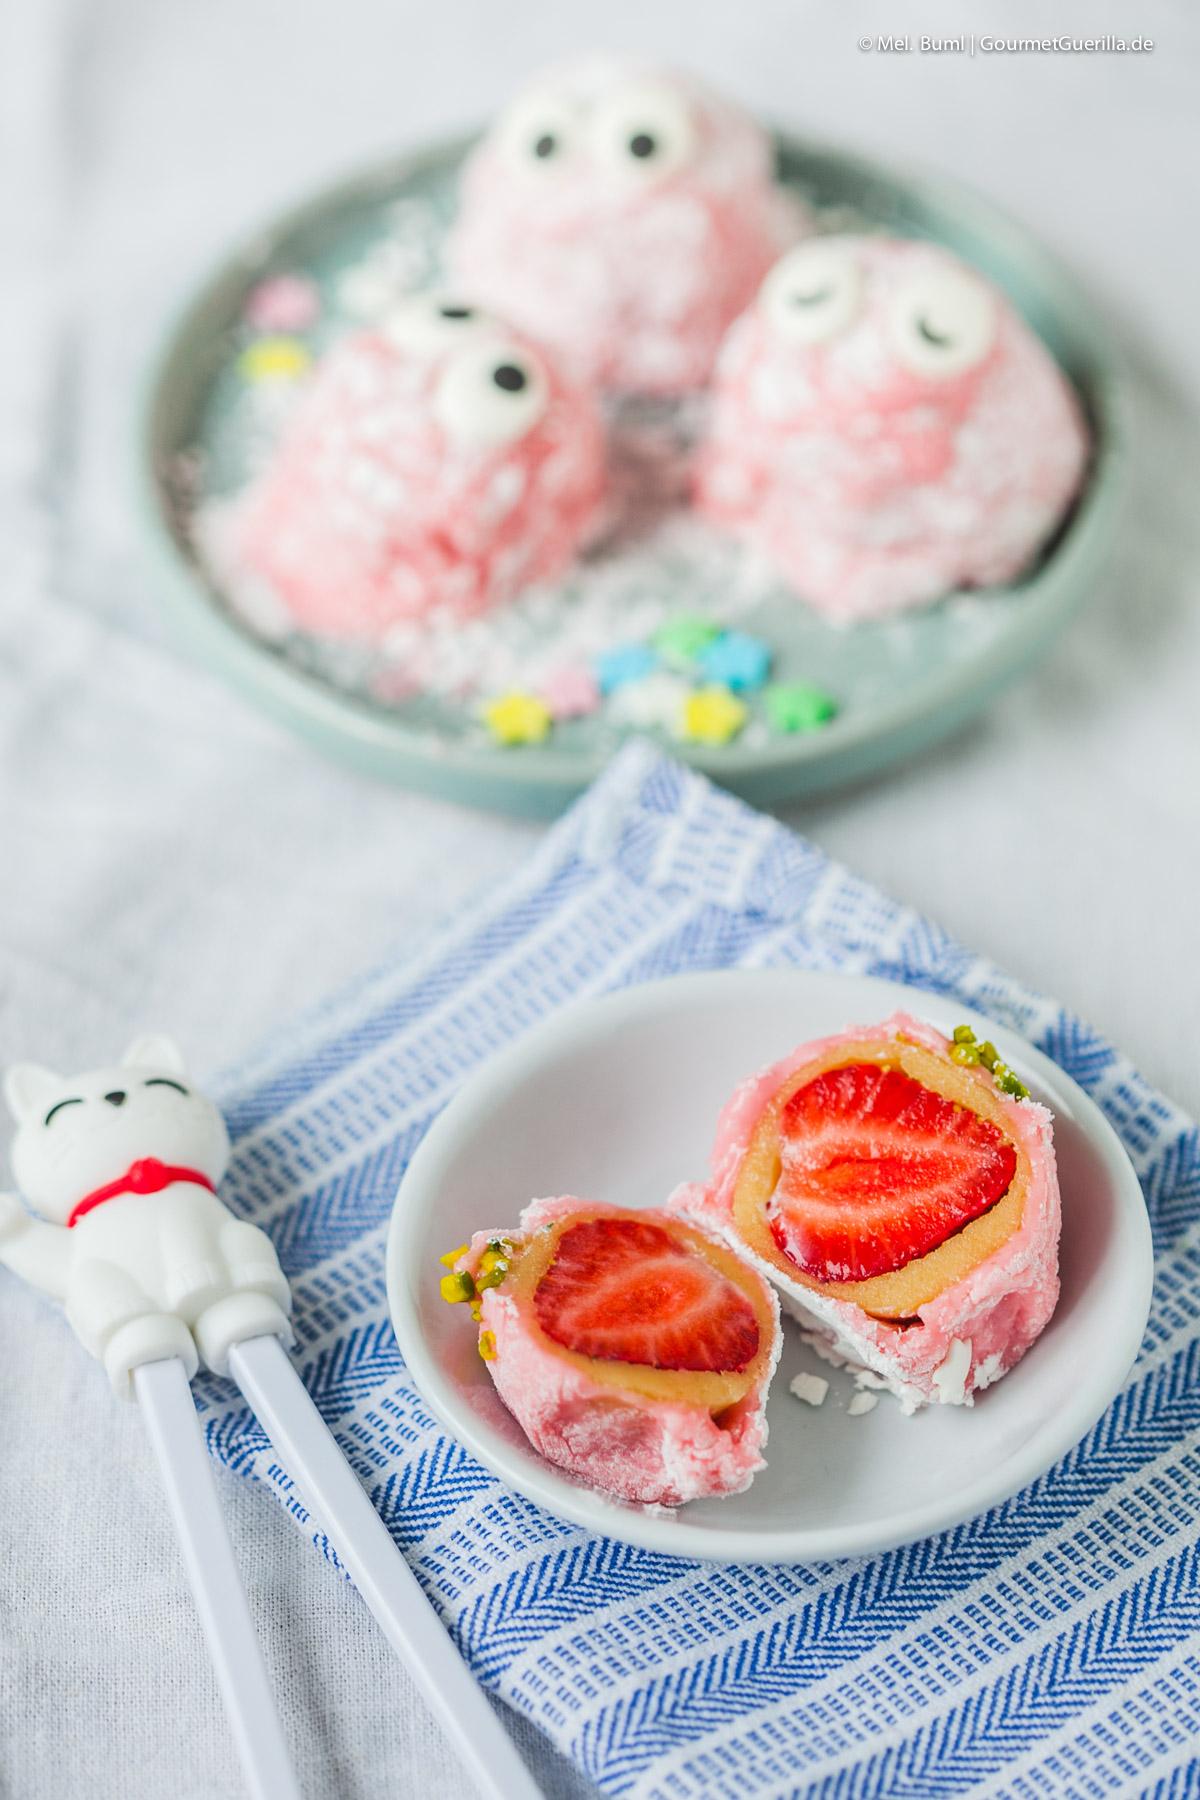 Rosa Daifuku mit Erdbeeren und Marzipan - japanisches Mochi-Konfekt |GourmetGuerilla.de